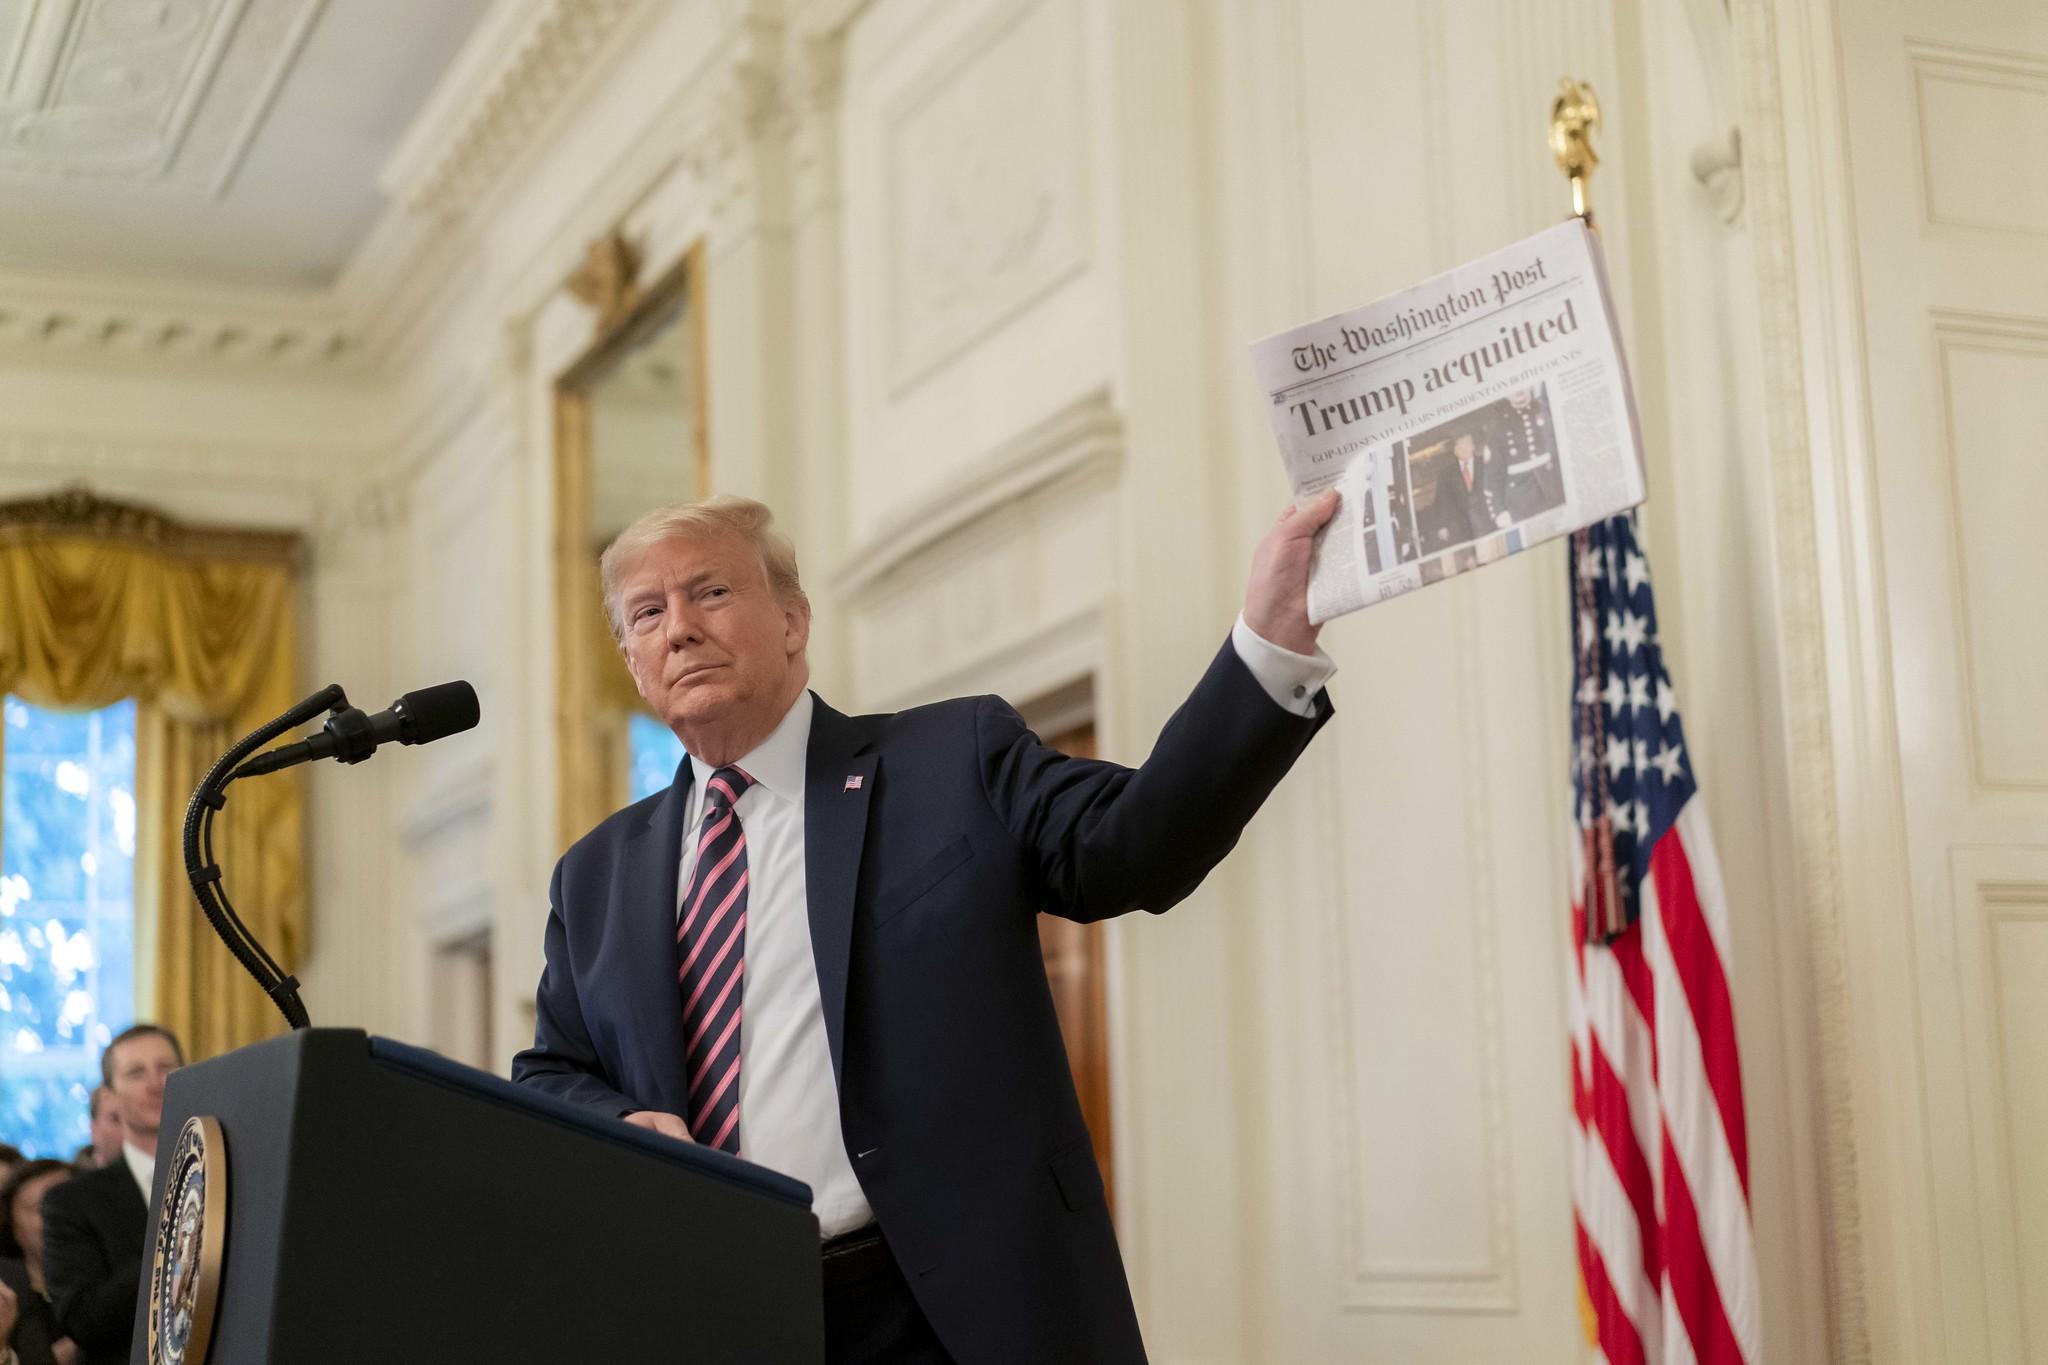 Donald Trump's second impeachment trial – how did it happen?